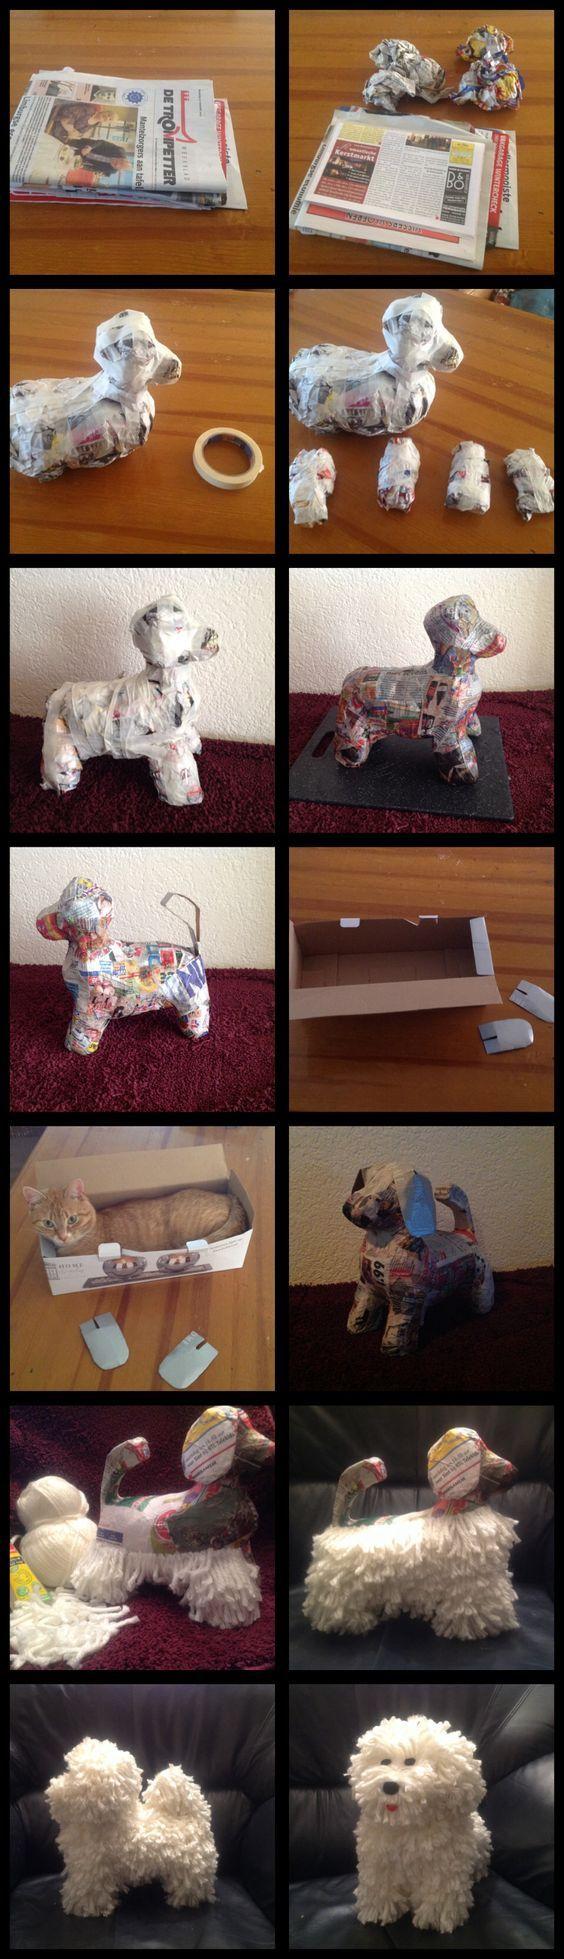 Mijn papier maché hondje My paper mache dog: